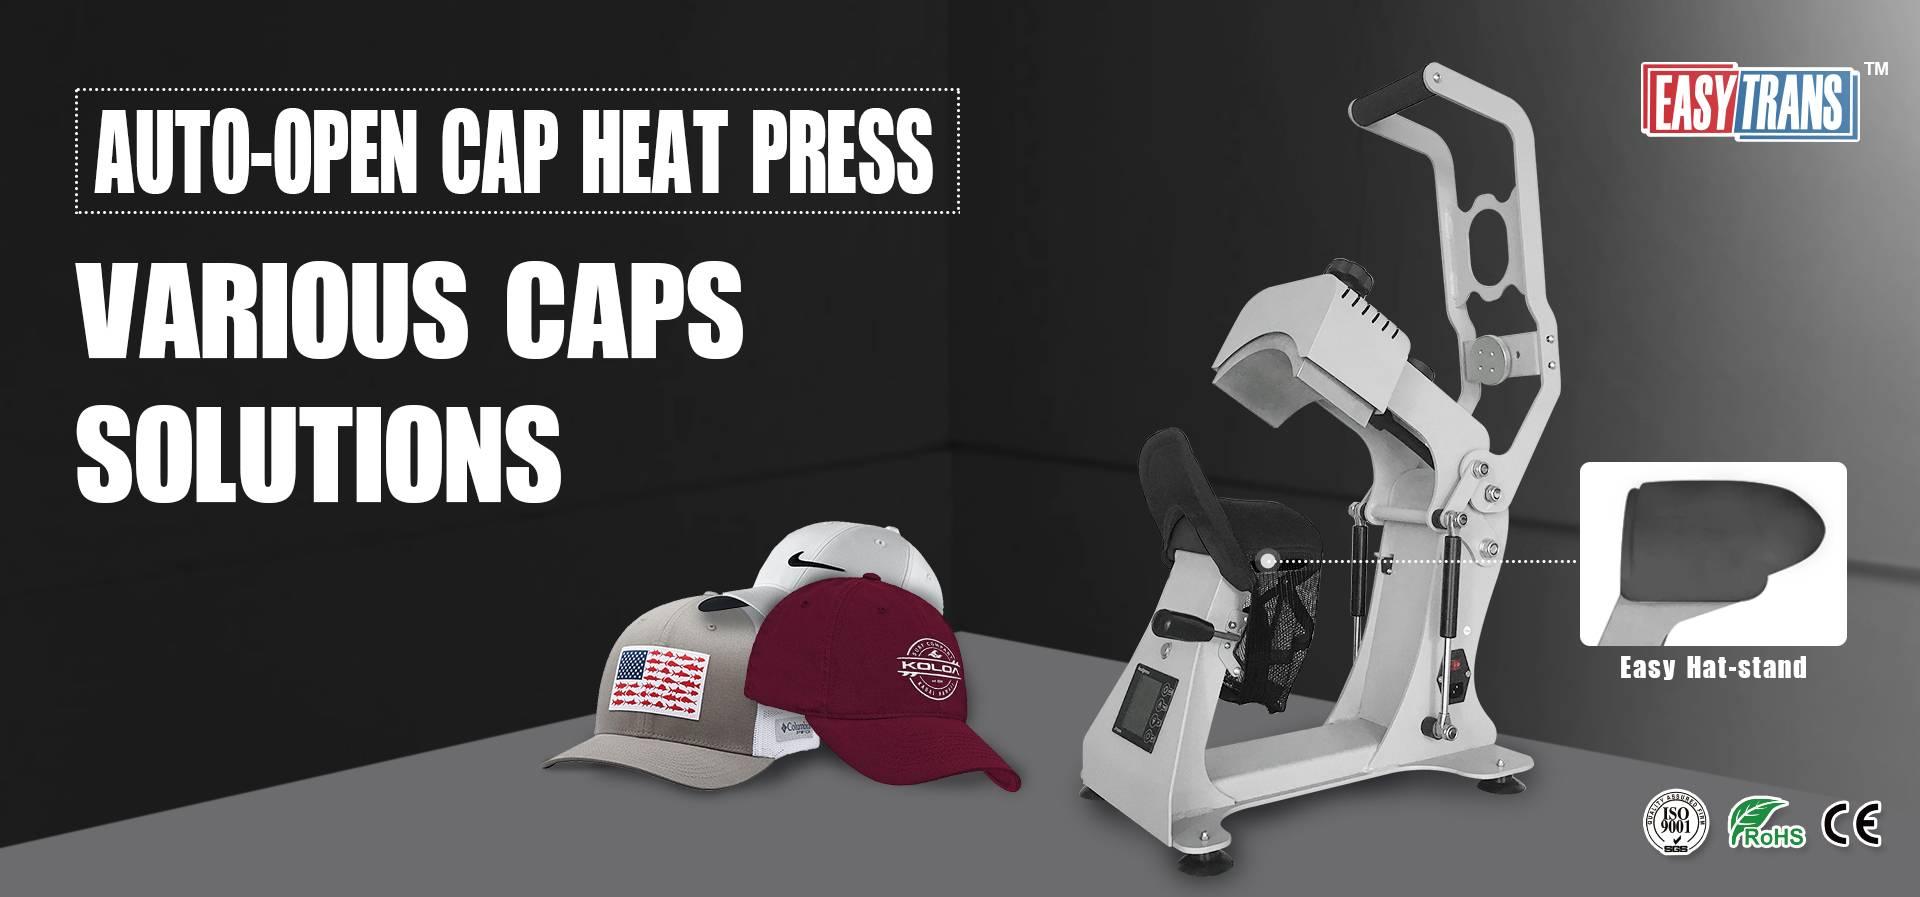 https://www.xheatpress.com/semi-auto-cap-heat-press-transfer-printing-machine-for-hats-product/